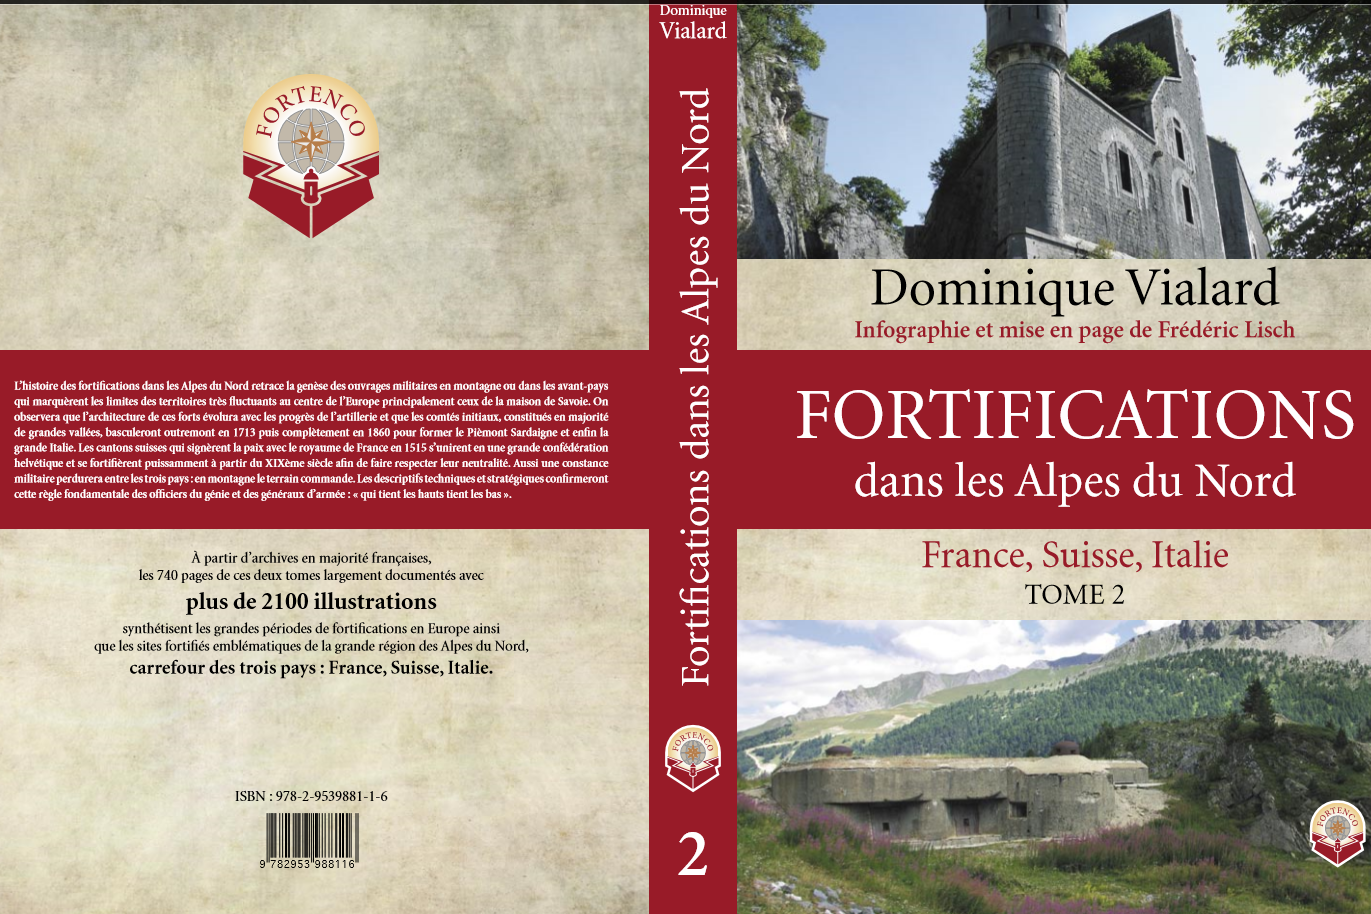 Fortifications dans les Alpes du nord Tome2